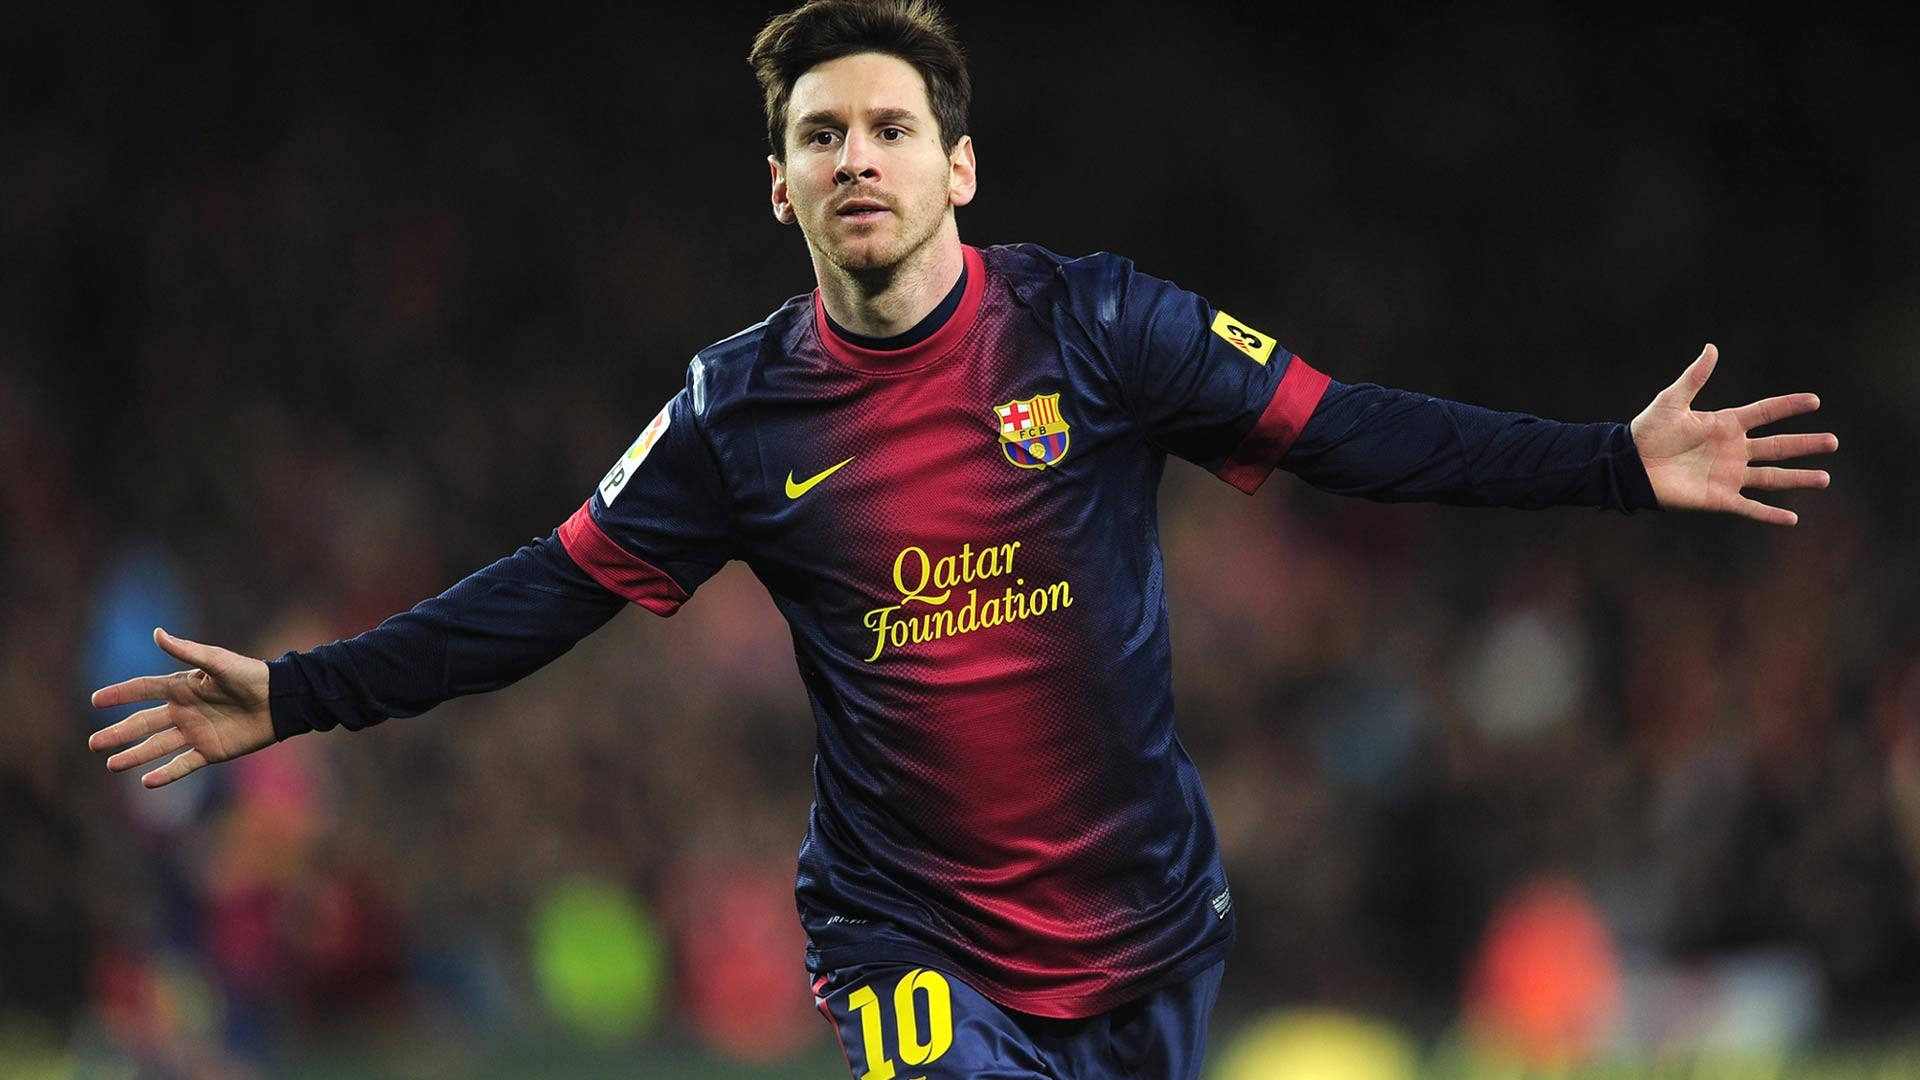 Lionel Messi Full Size Hd: Lionel Messi 2018 Wallpaper HD 1080p ·① WallpaperTag